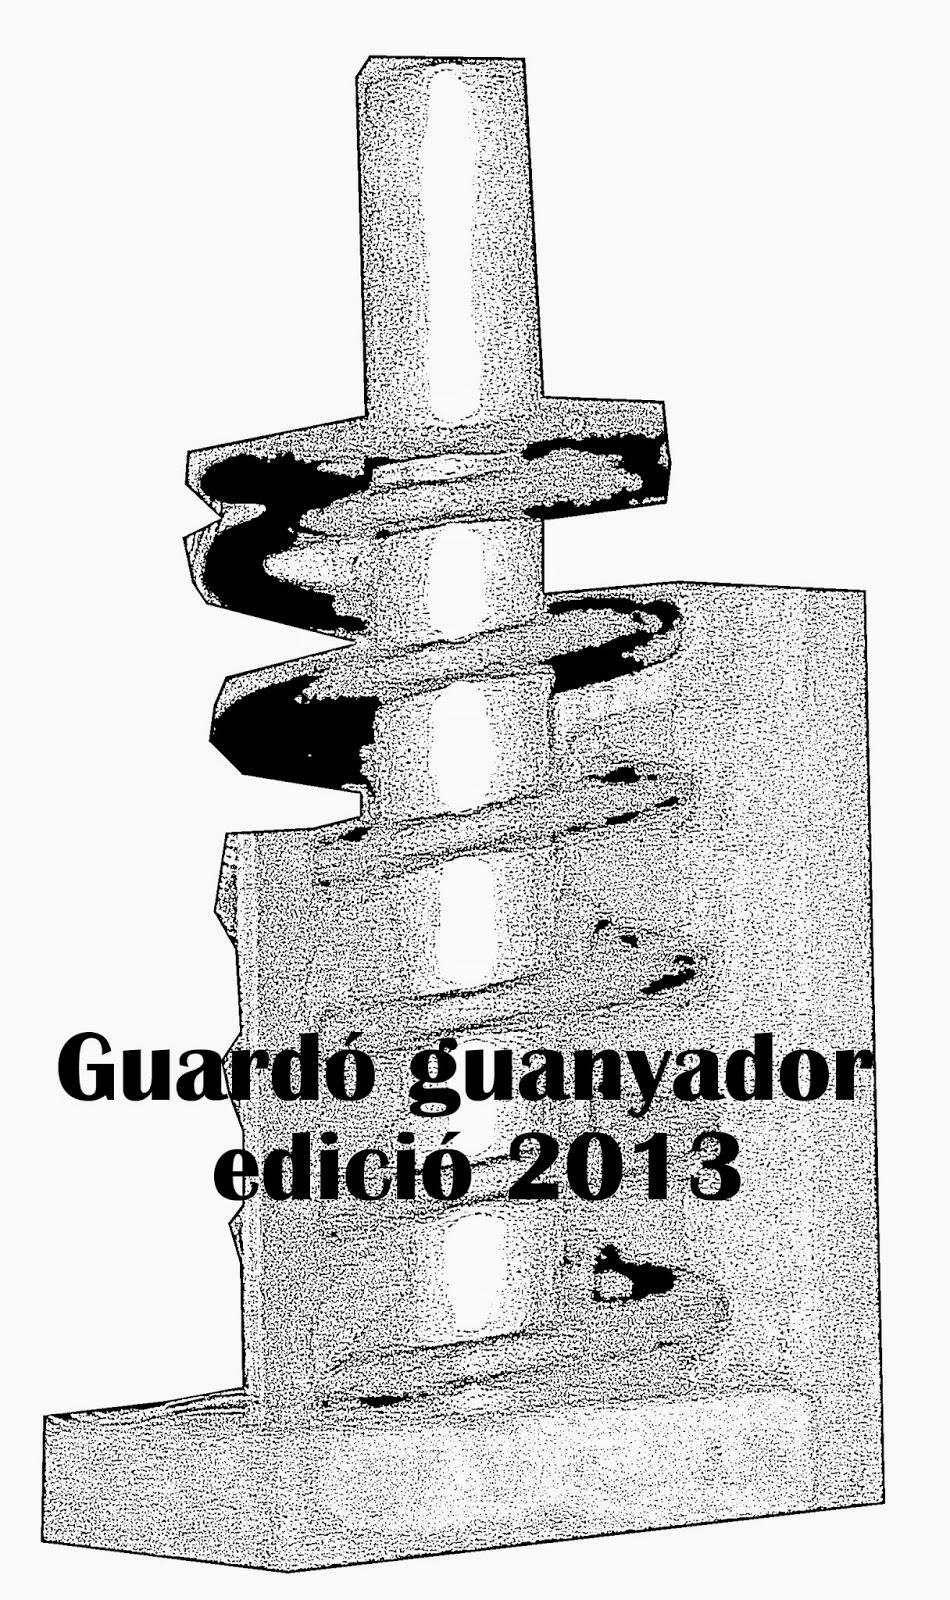 http://es.calameo.com/read/002054465b963c93c161b